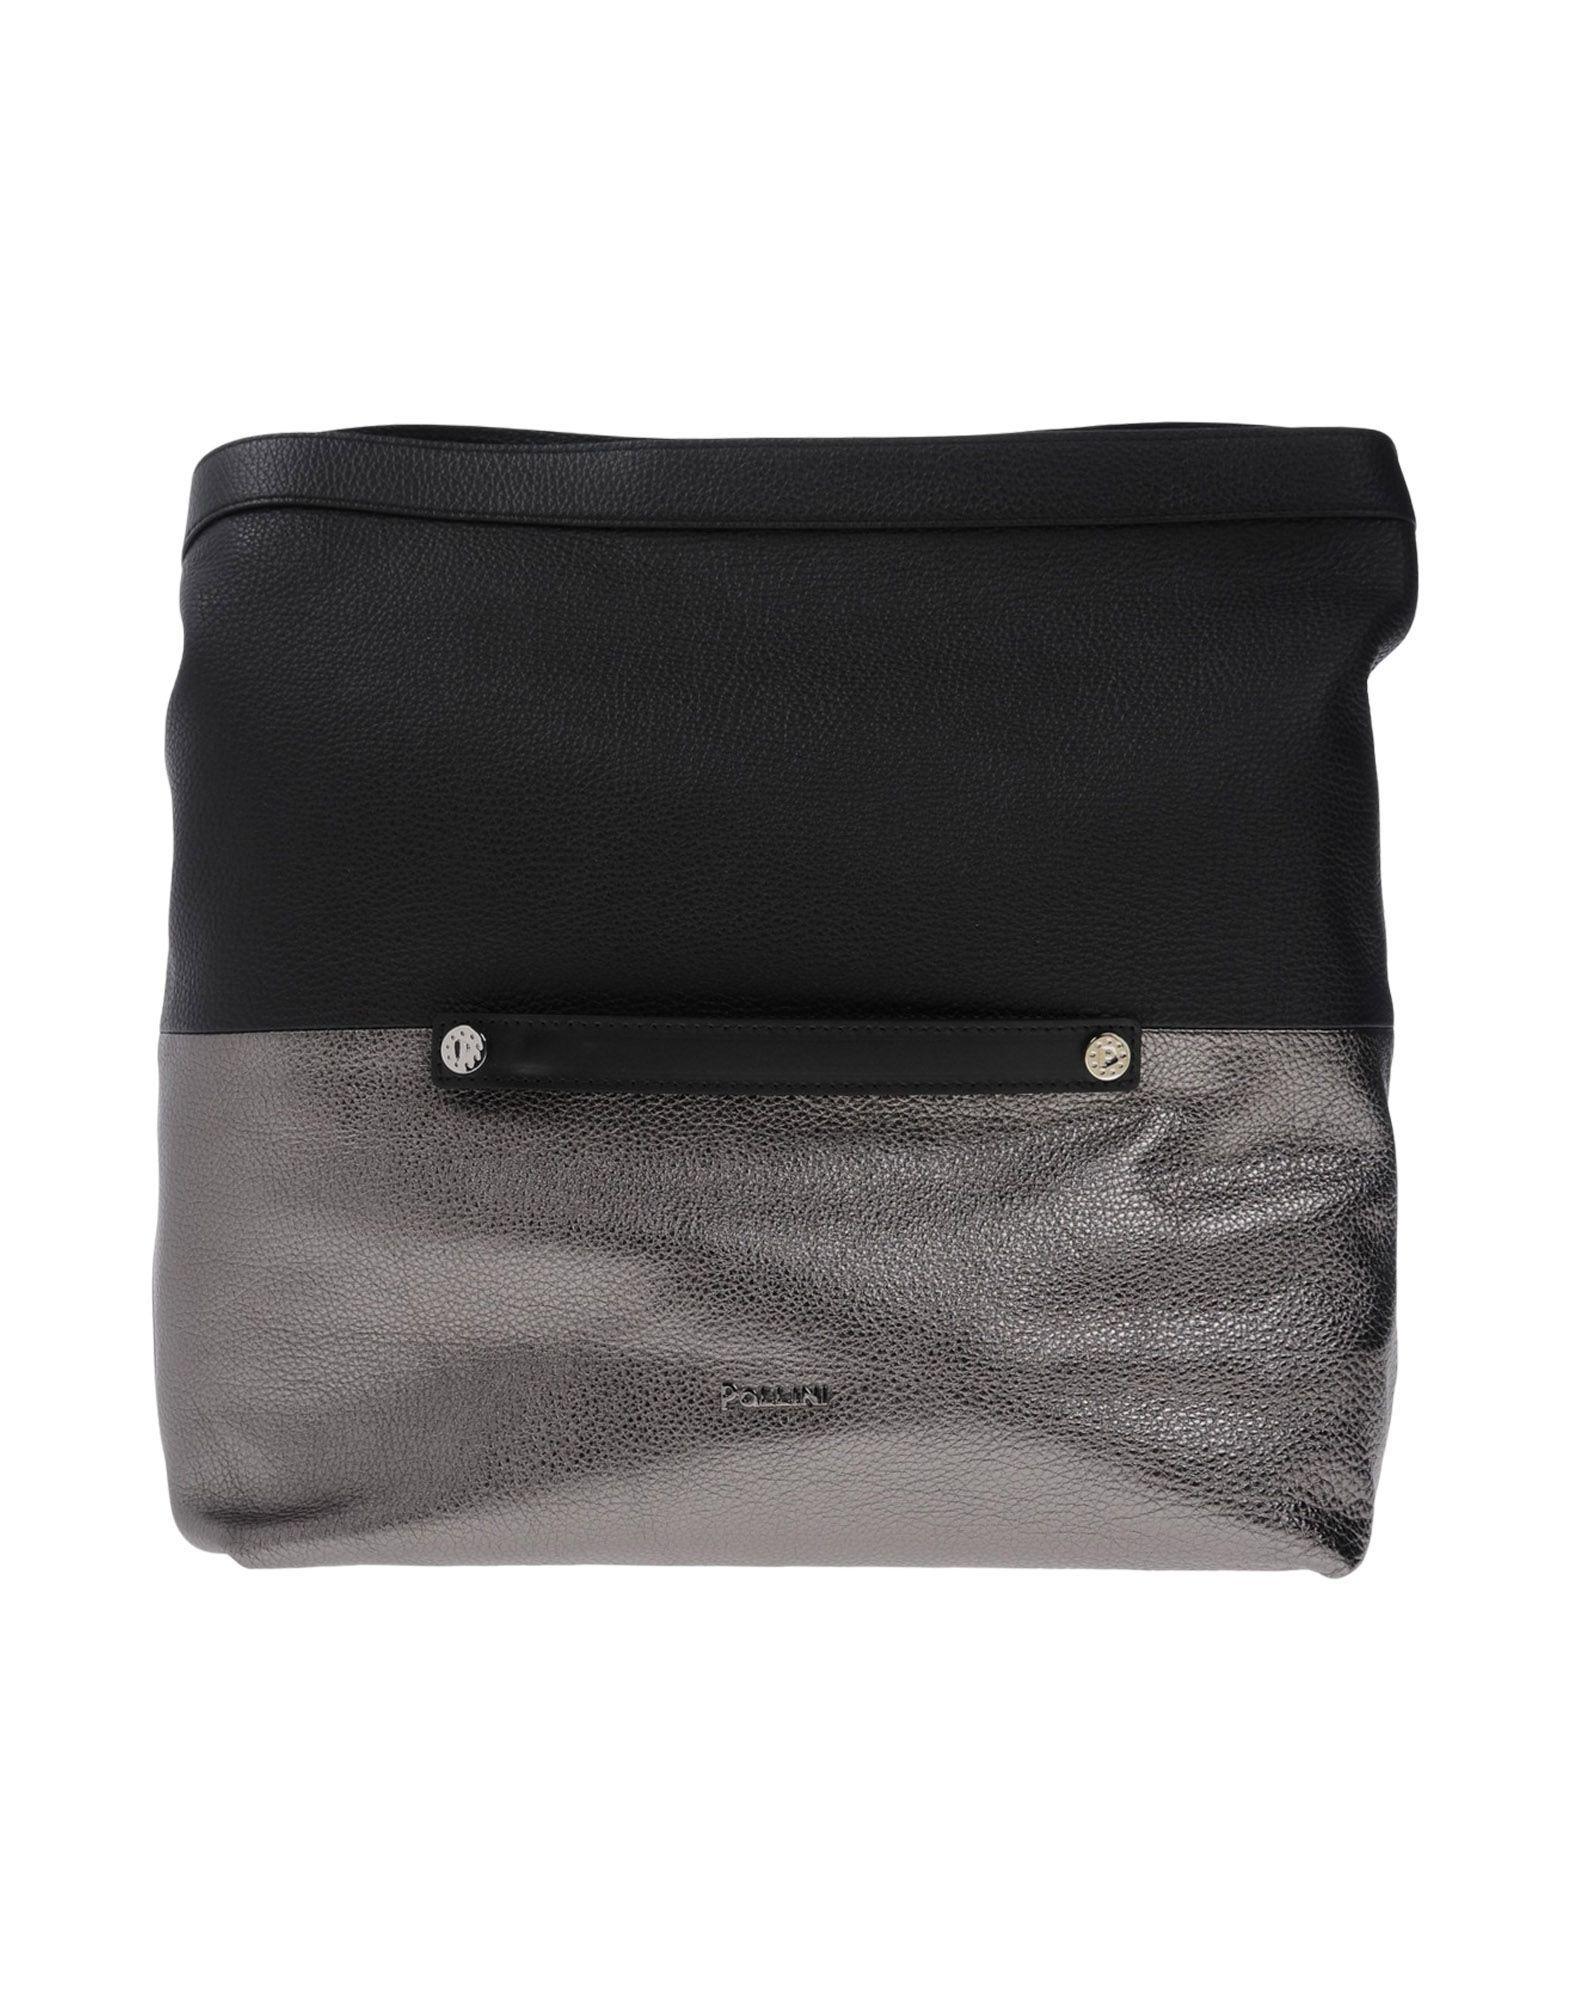 Pollini Handbags In Black